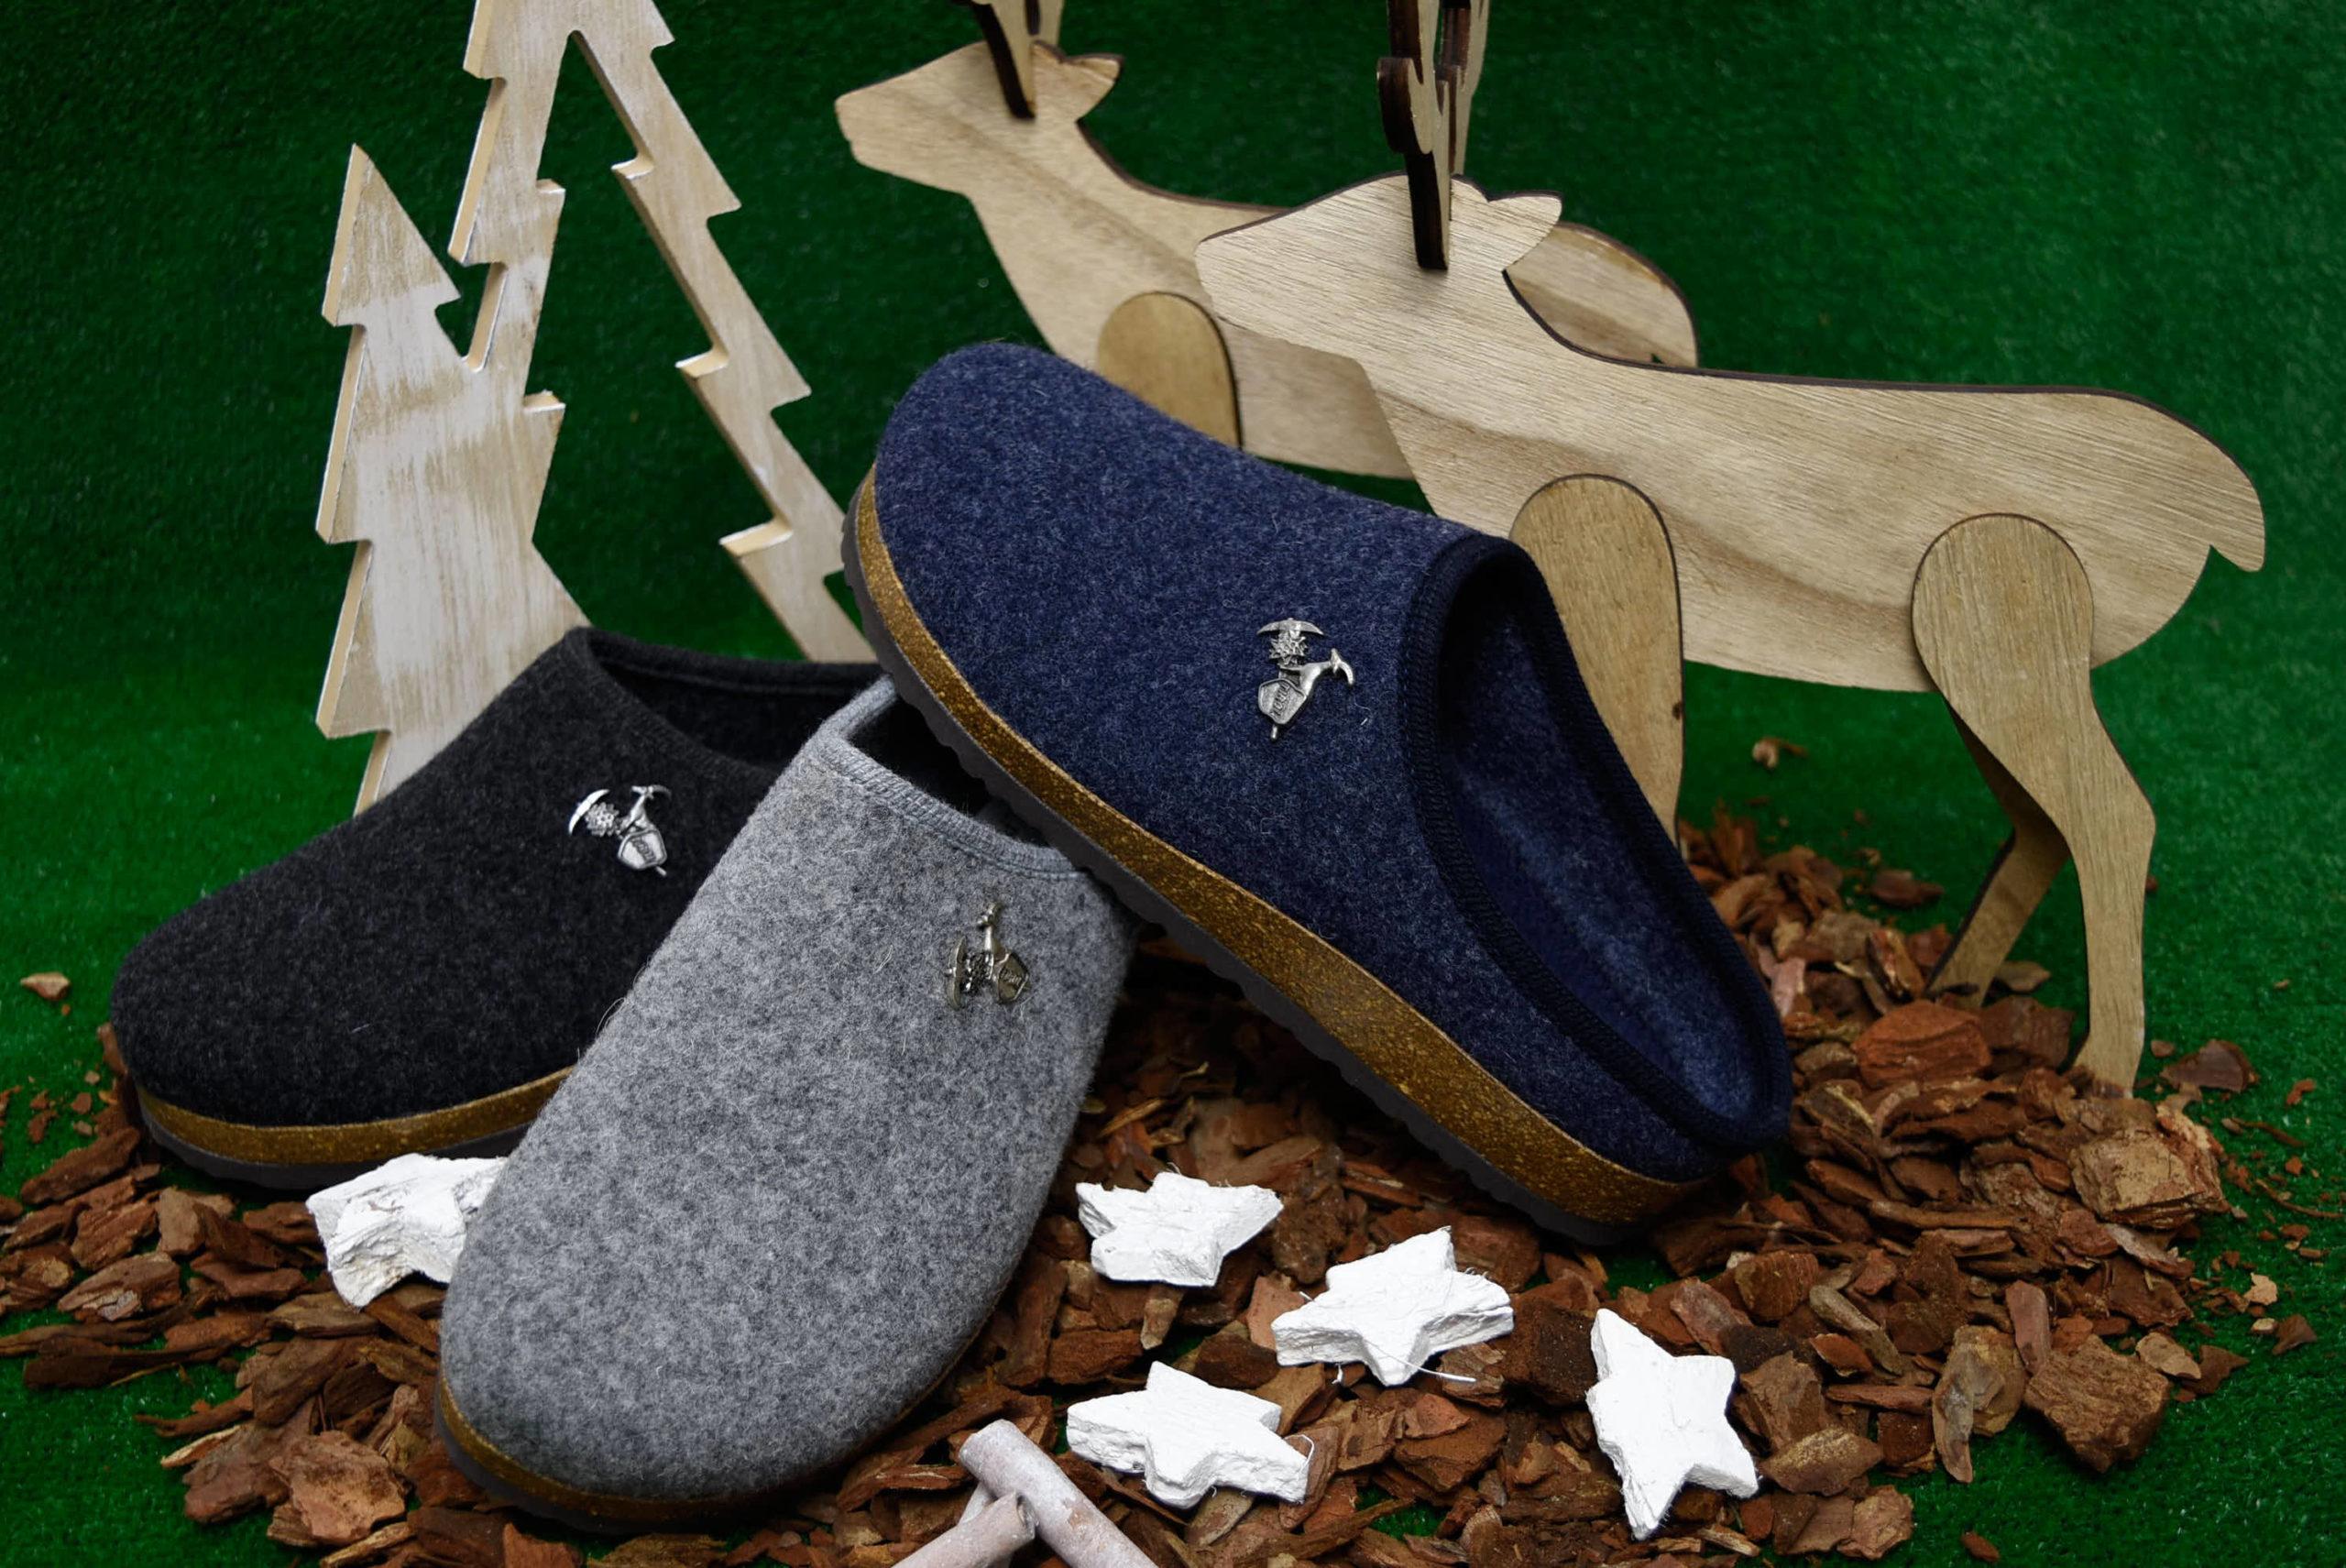 bio alpes 976 jeans grigio antracite ciabatte natalizie da donna pantofole tirolesi calzature tradizionali altoatesine feltro lana cotta